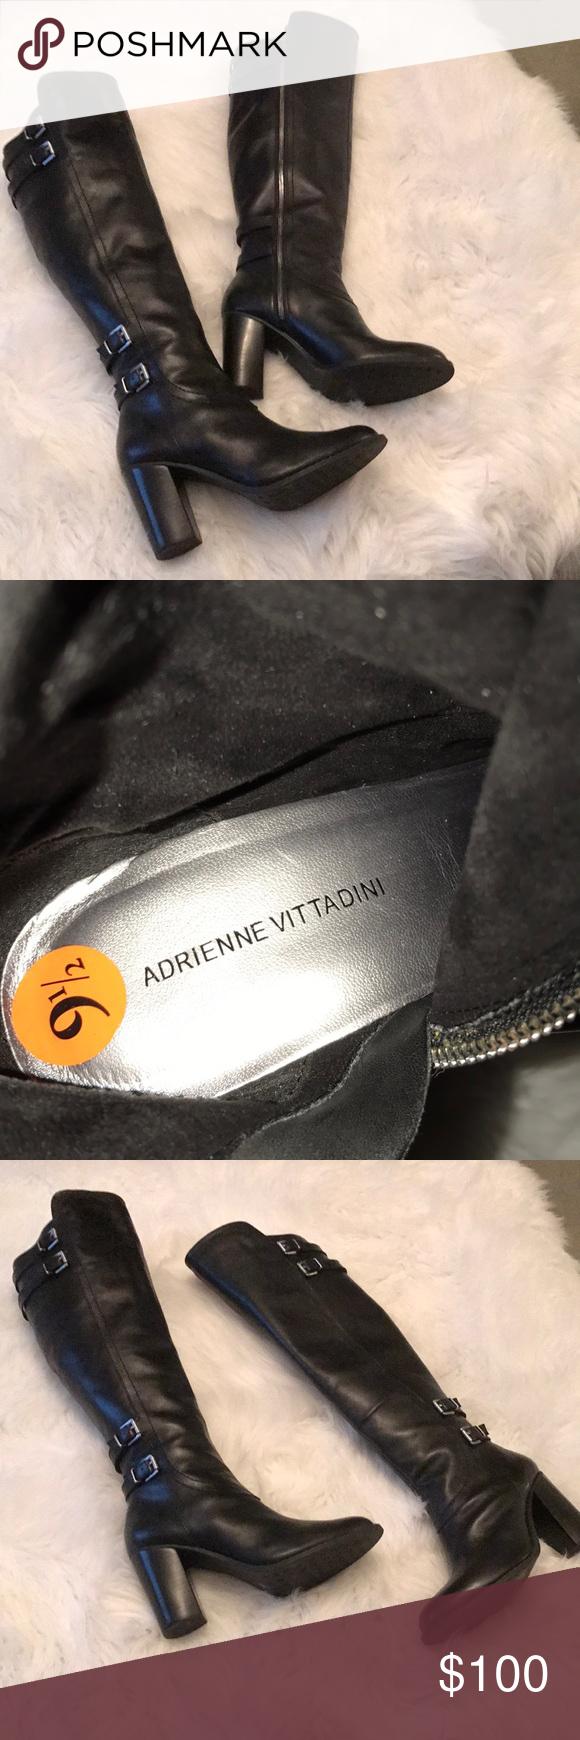 ea56eb14c3b Black Boots Adrienne Vittadini. Leather Boots Black Leather Over the Knee  Boots.. Adrienne Vittadini.. Were Worn once.. Adrienne Vittadini Shoes Over  the ...